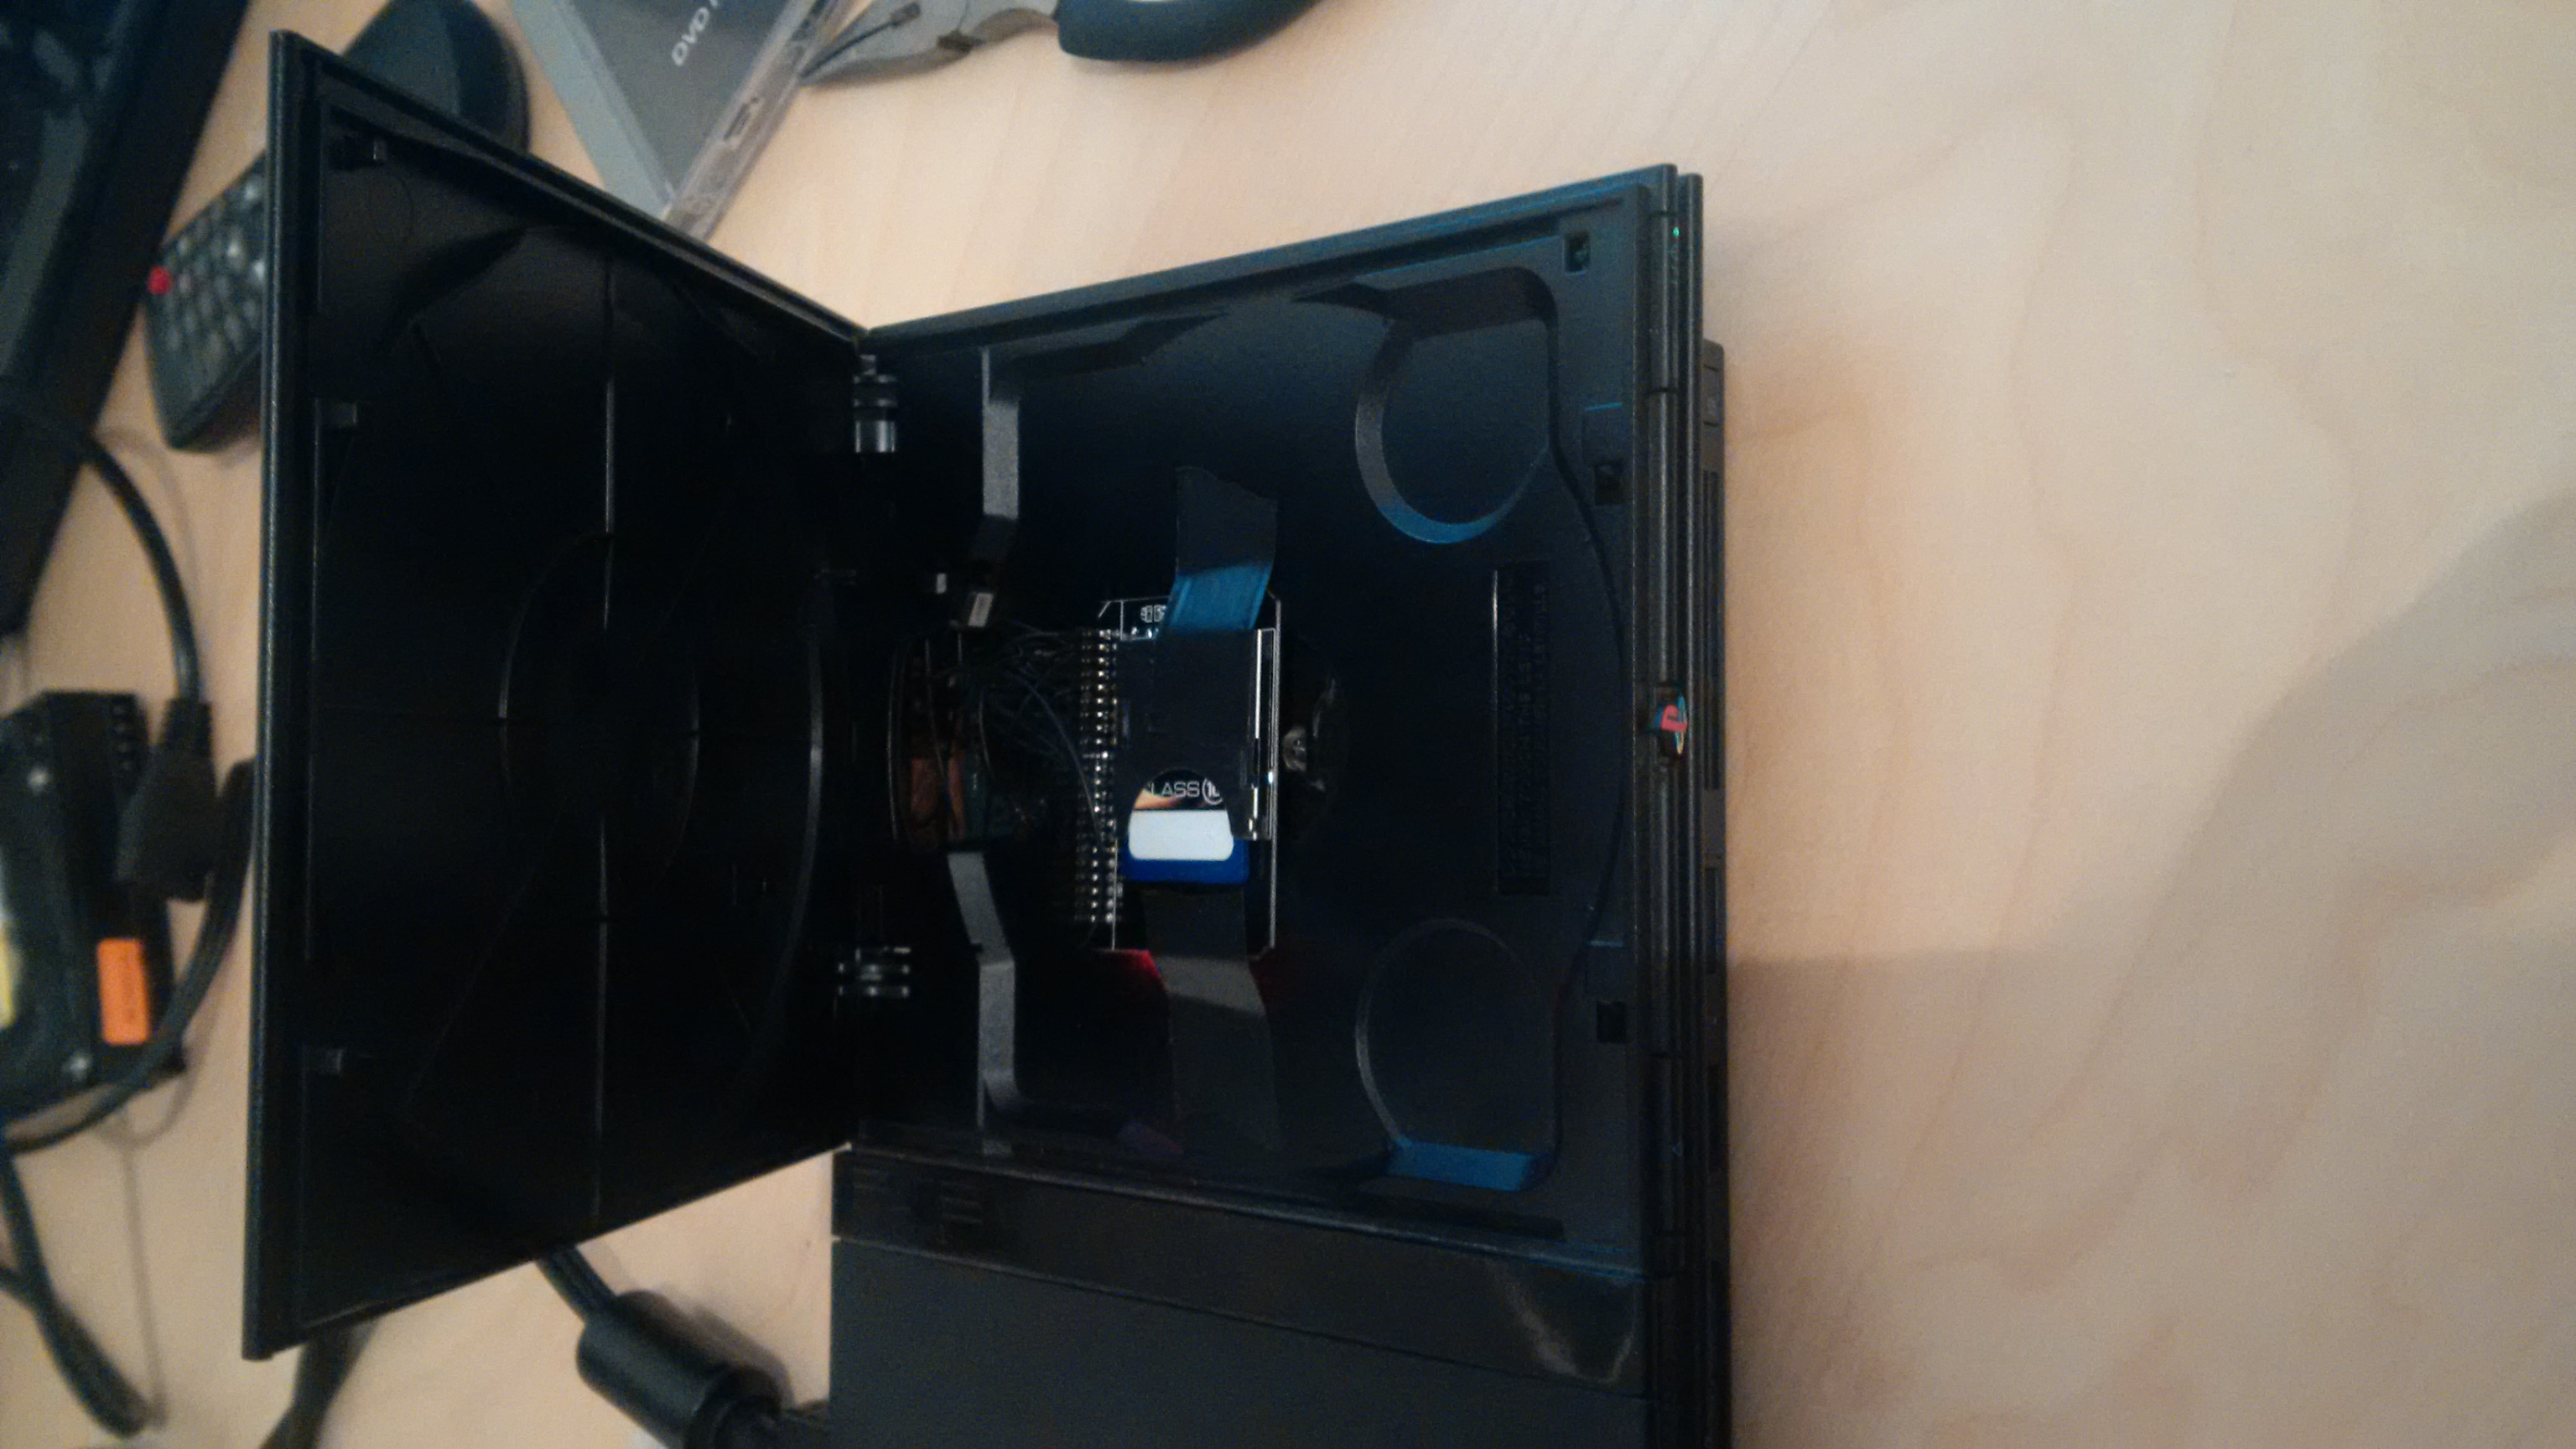 PS2 Slim SCPH 7000x Serie mit SD Karte betreiben - Sony - Circuit-Board